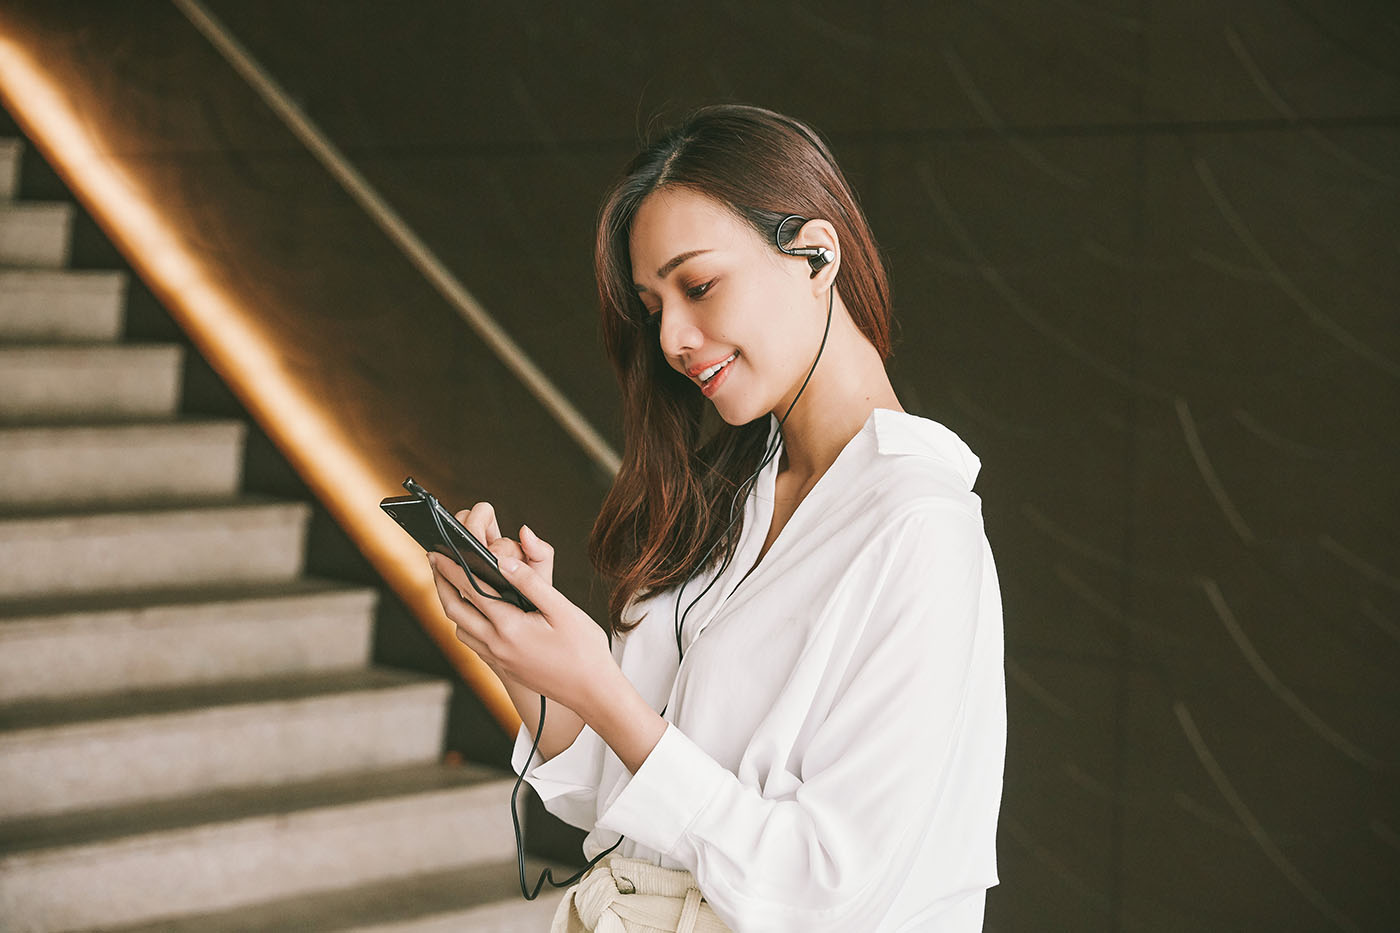 ATH-IEX1 是一款具備 Hi-Res 認�的高解析規格耳機,而內建的混合材質單體也帶來 5Hz〜50Hz 頻率響應表現,效率更高達 102dB/mW,因�即便以線材接駁一般手機的 3.5mm 耳機輸出�來聆聽音樂,也能聽到讓人滿意的聲音表現。